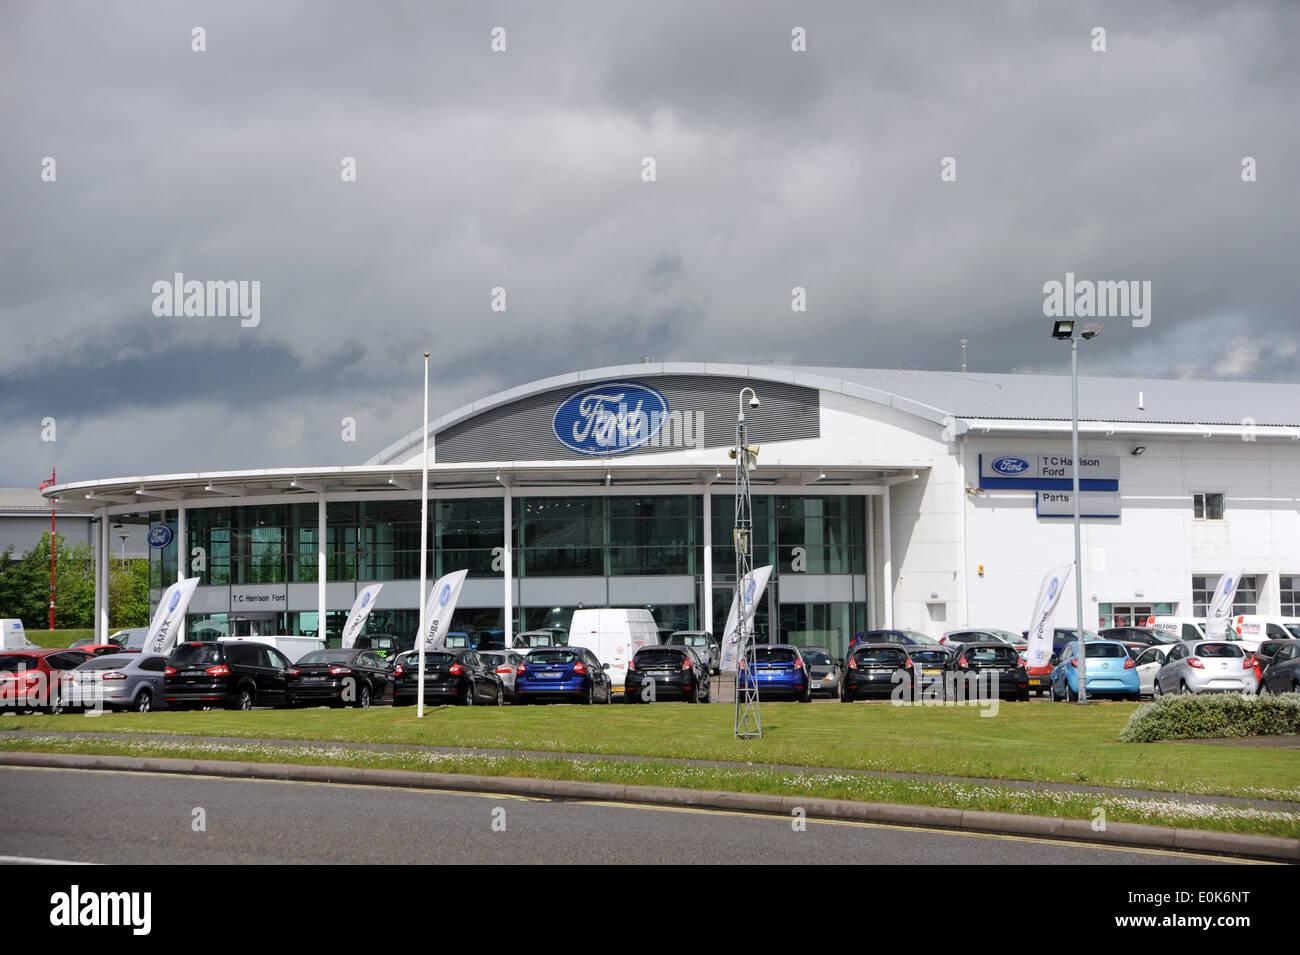 O Regans Toyota Dartmouth >> New Used Car Showroom Stock Photos & New Used Car Showroom ...